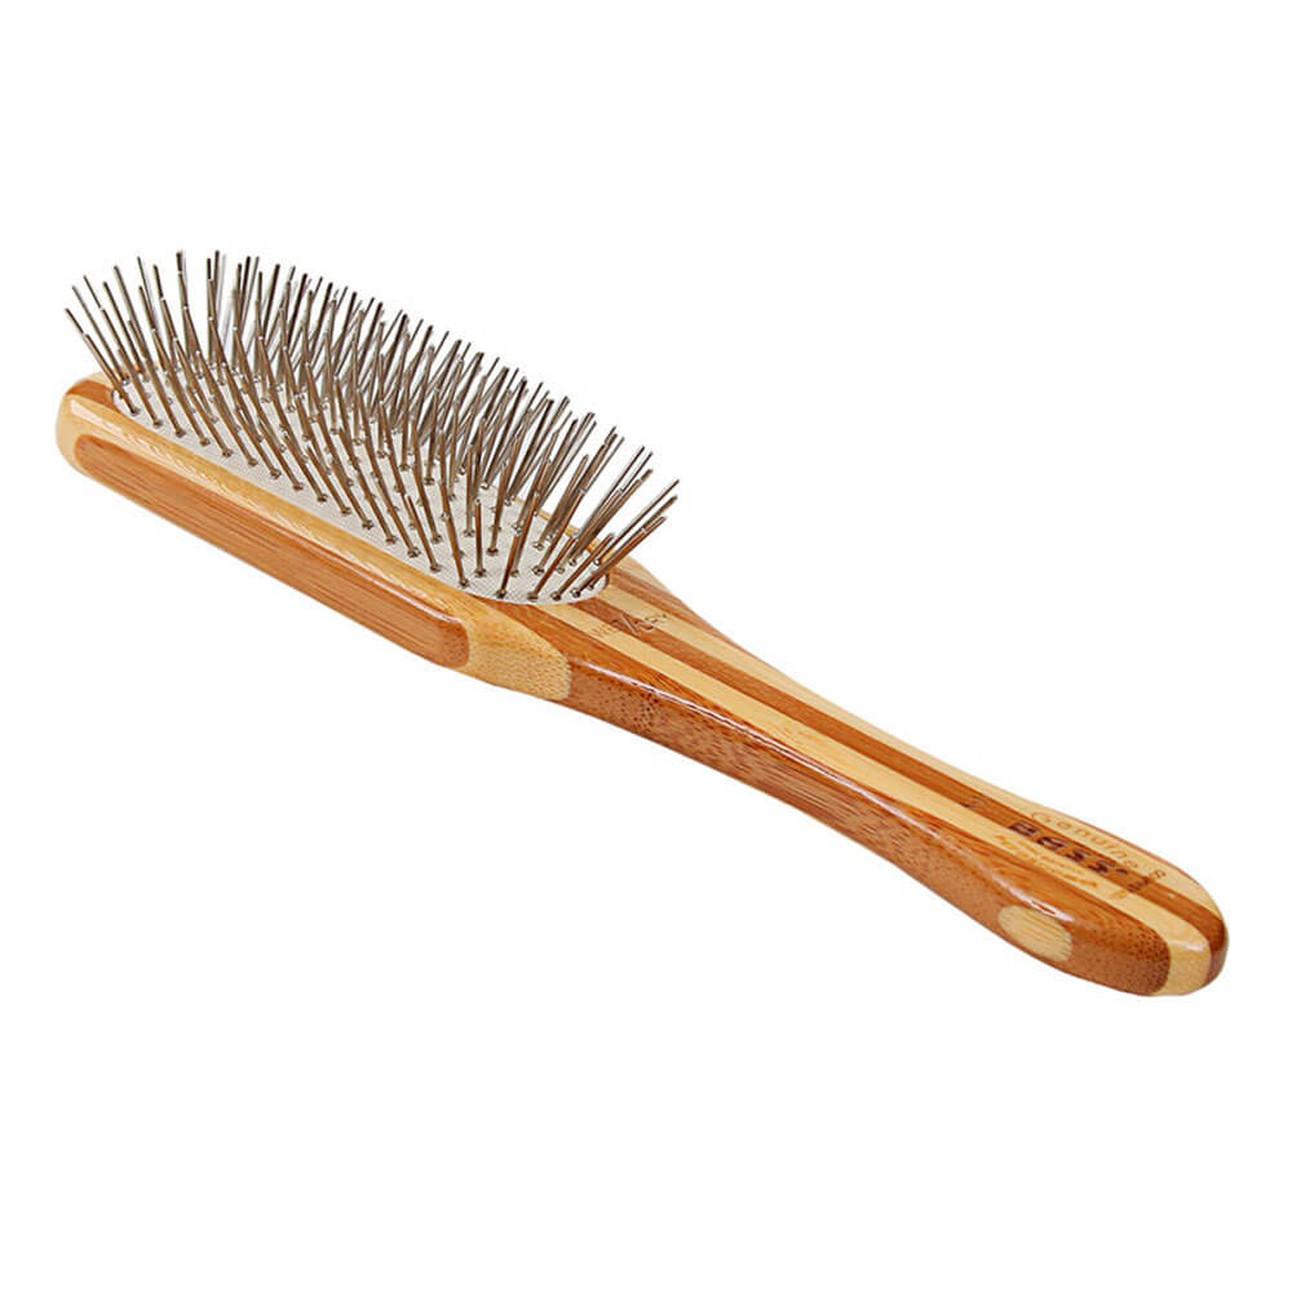 Bass Oblong Pin Brush